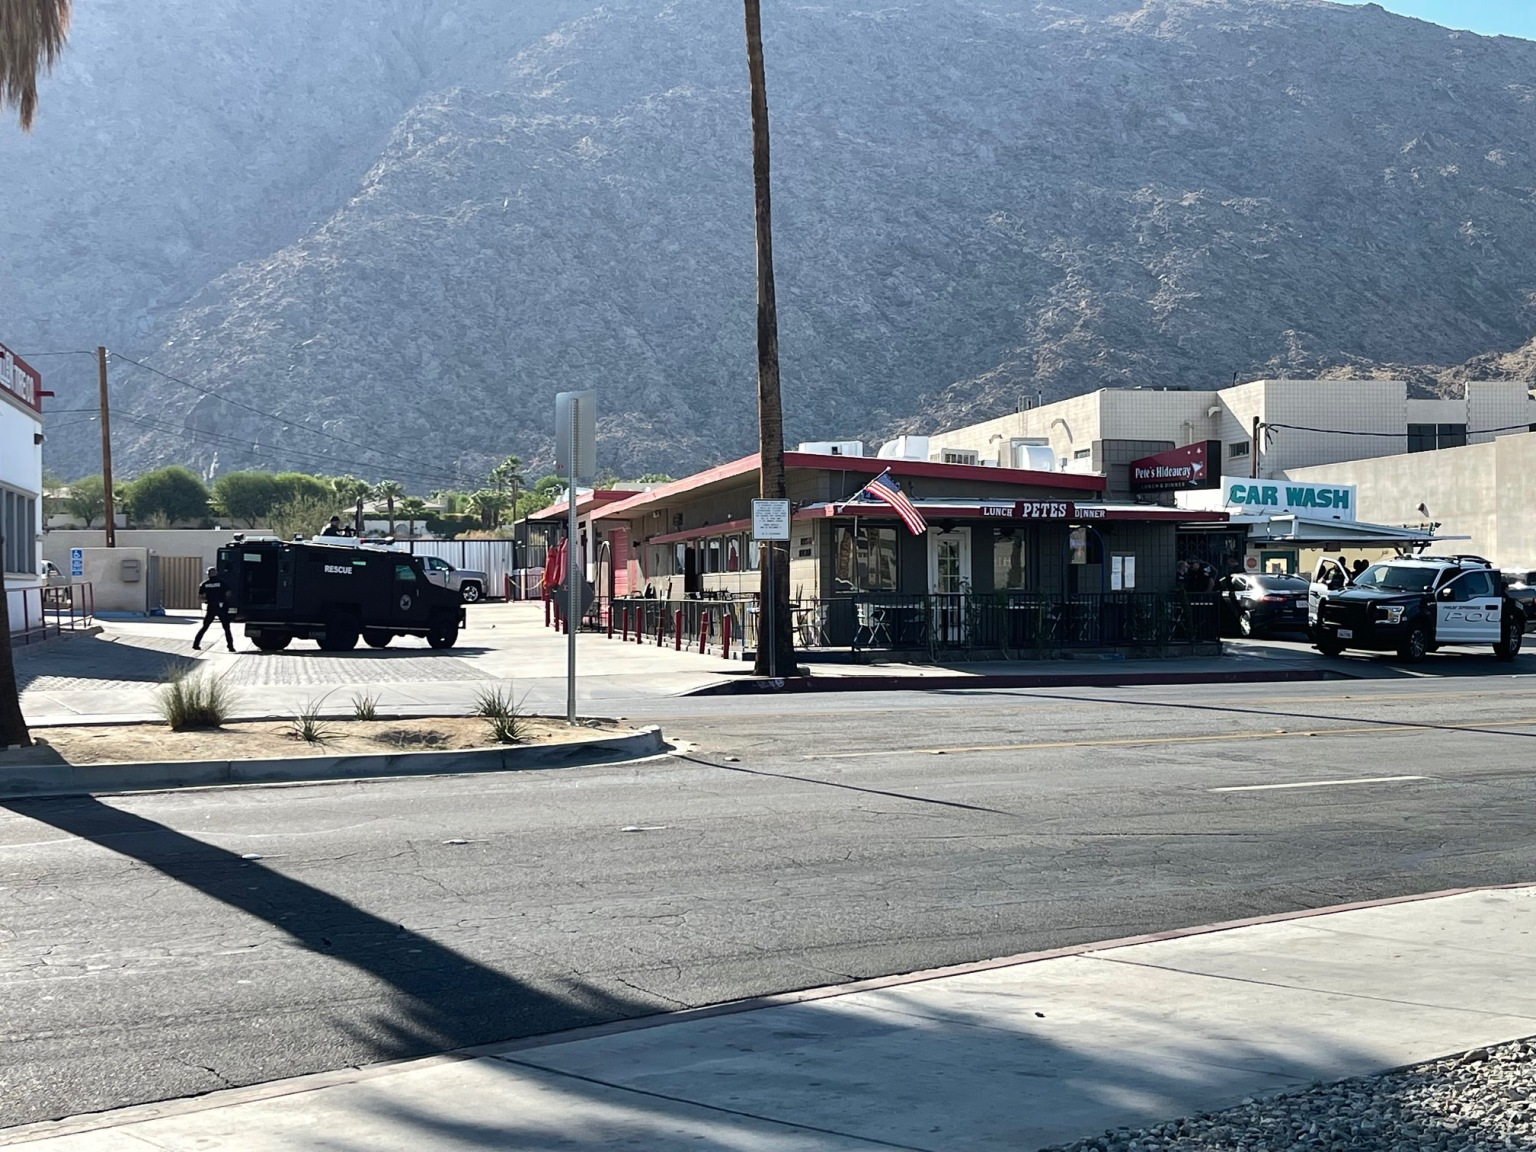 Suspicious Circumstances Cause Police to Surround Palm Springs Restaurant